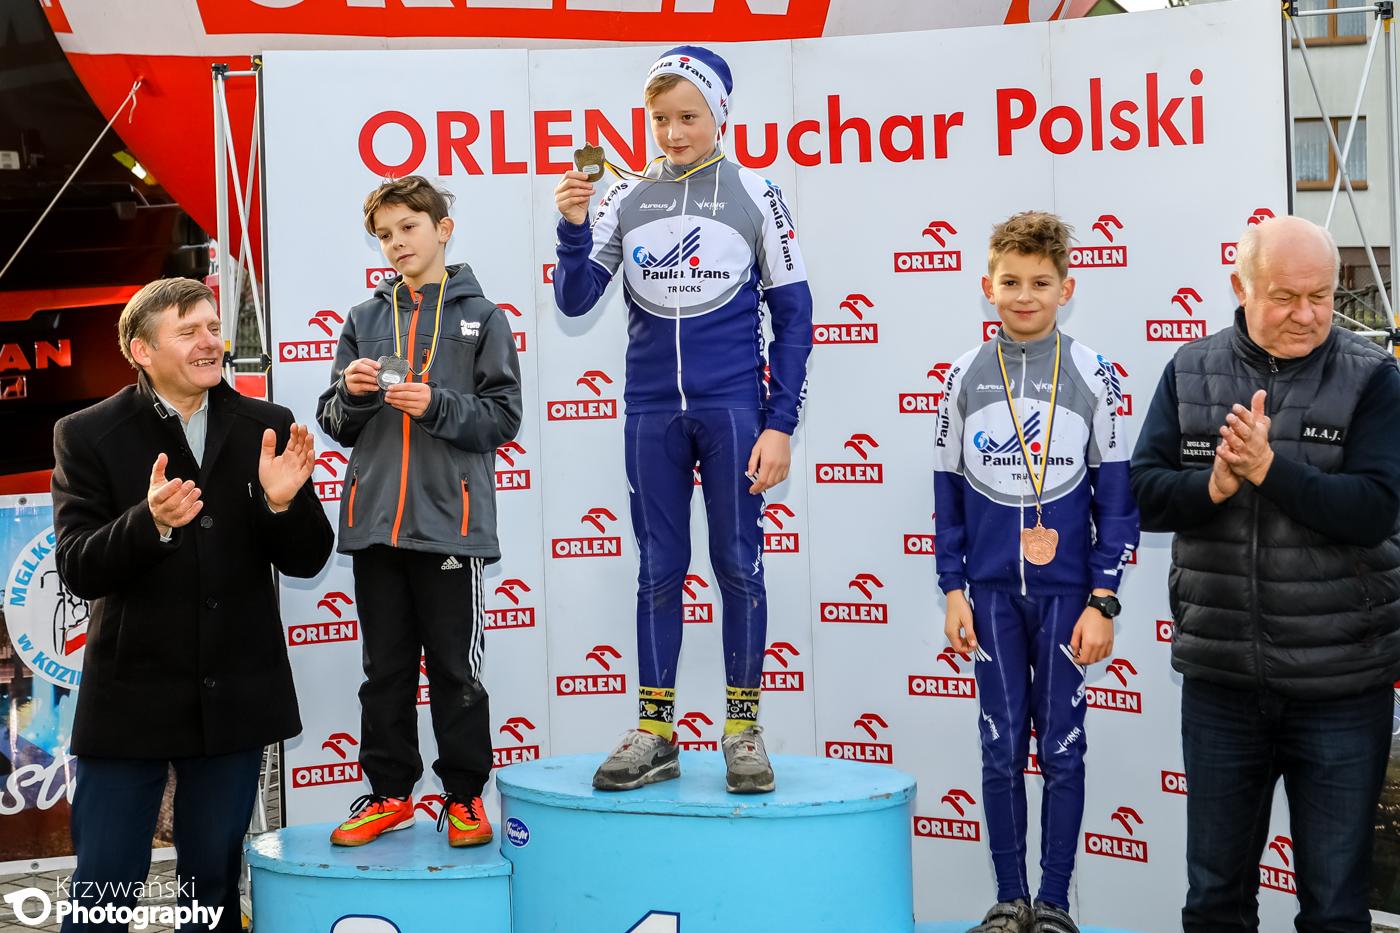 http://magazynrowerowy.pl/logmein/wp-content/uploads/2017/11/Orlen-PP-CX-VIII-seria_Kozieglowy_1329_.jpg